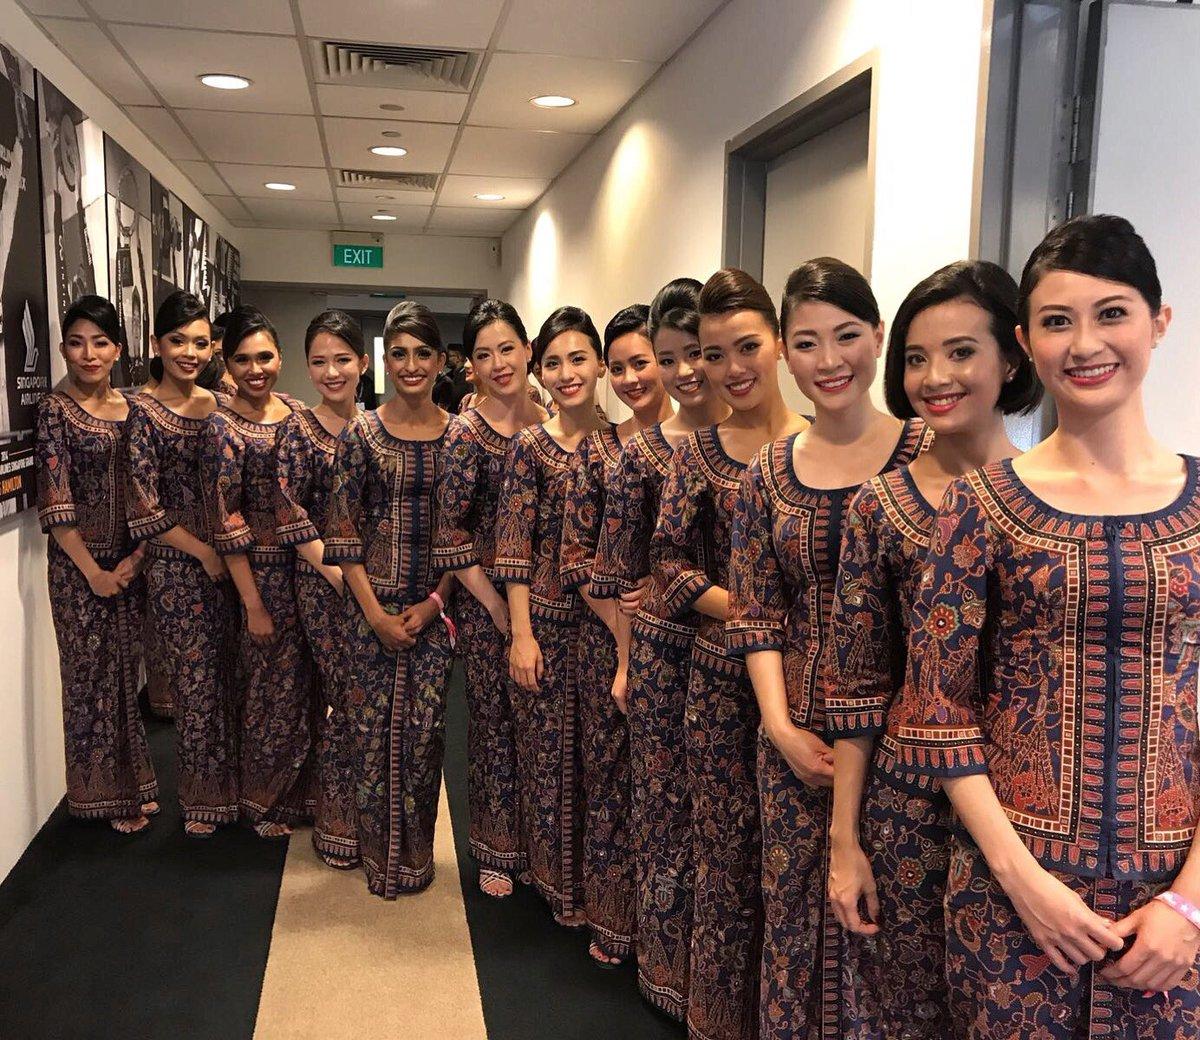 In girls where singapore to get Beautiful Singaporean